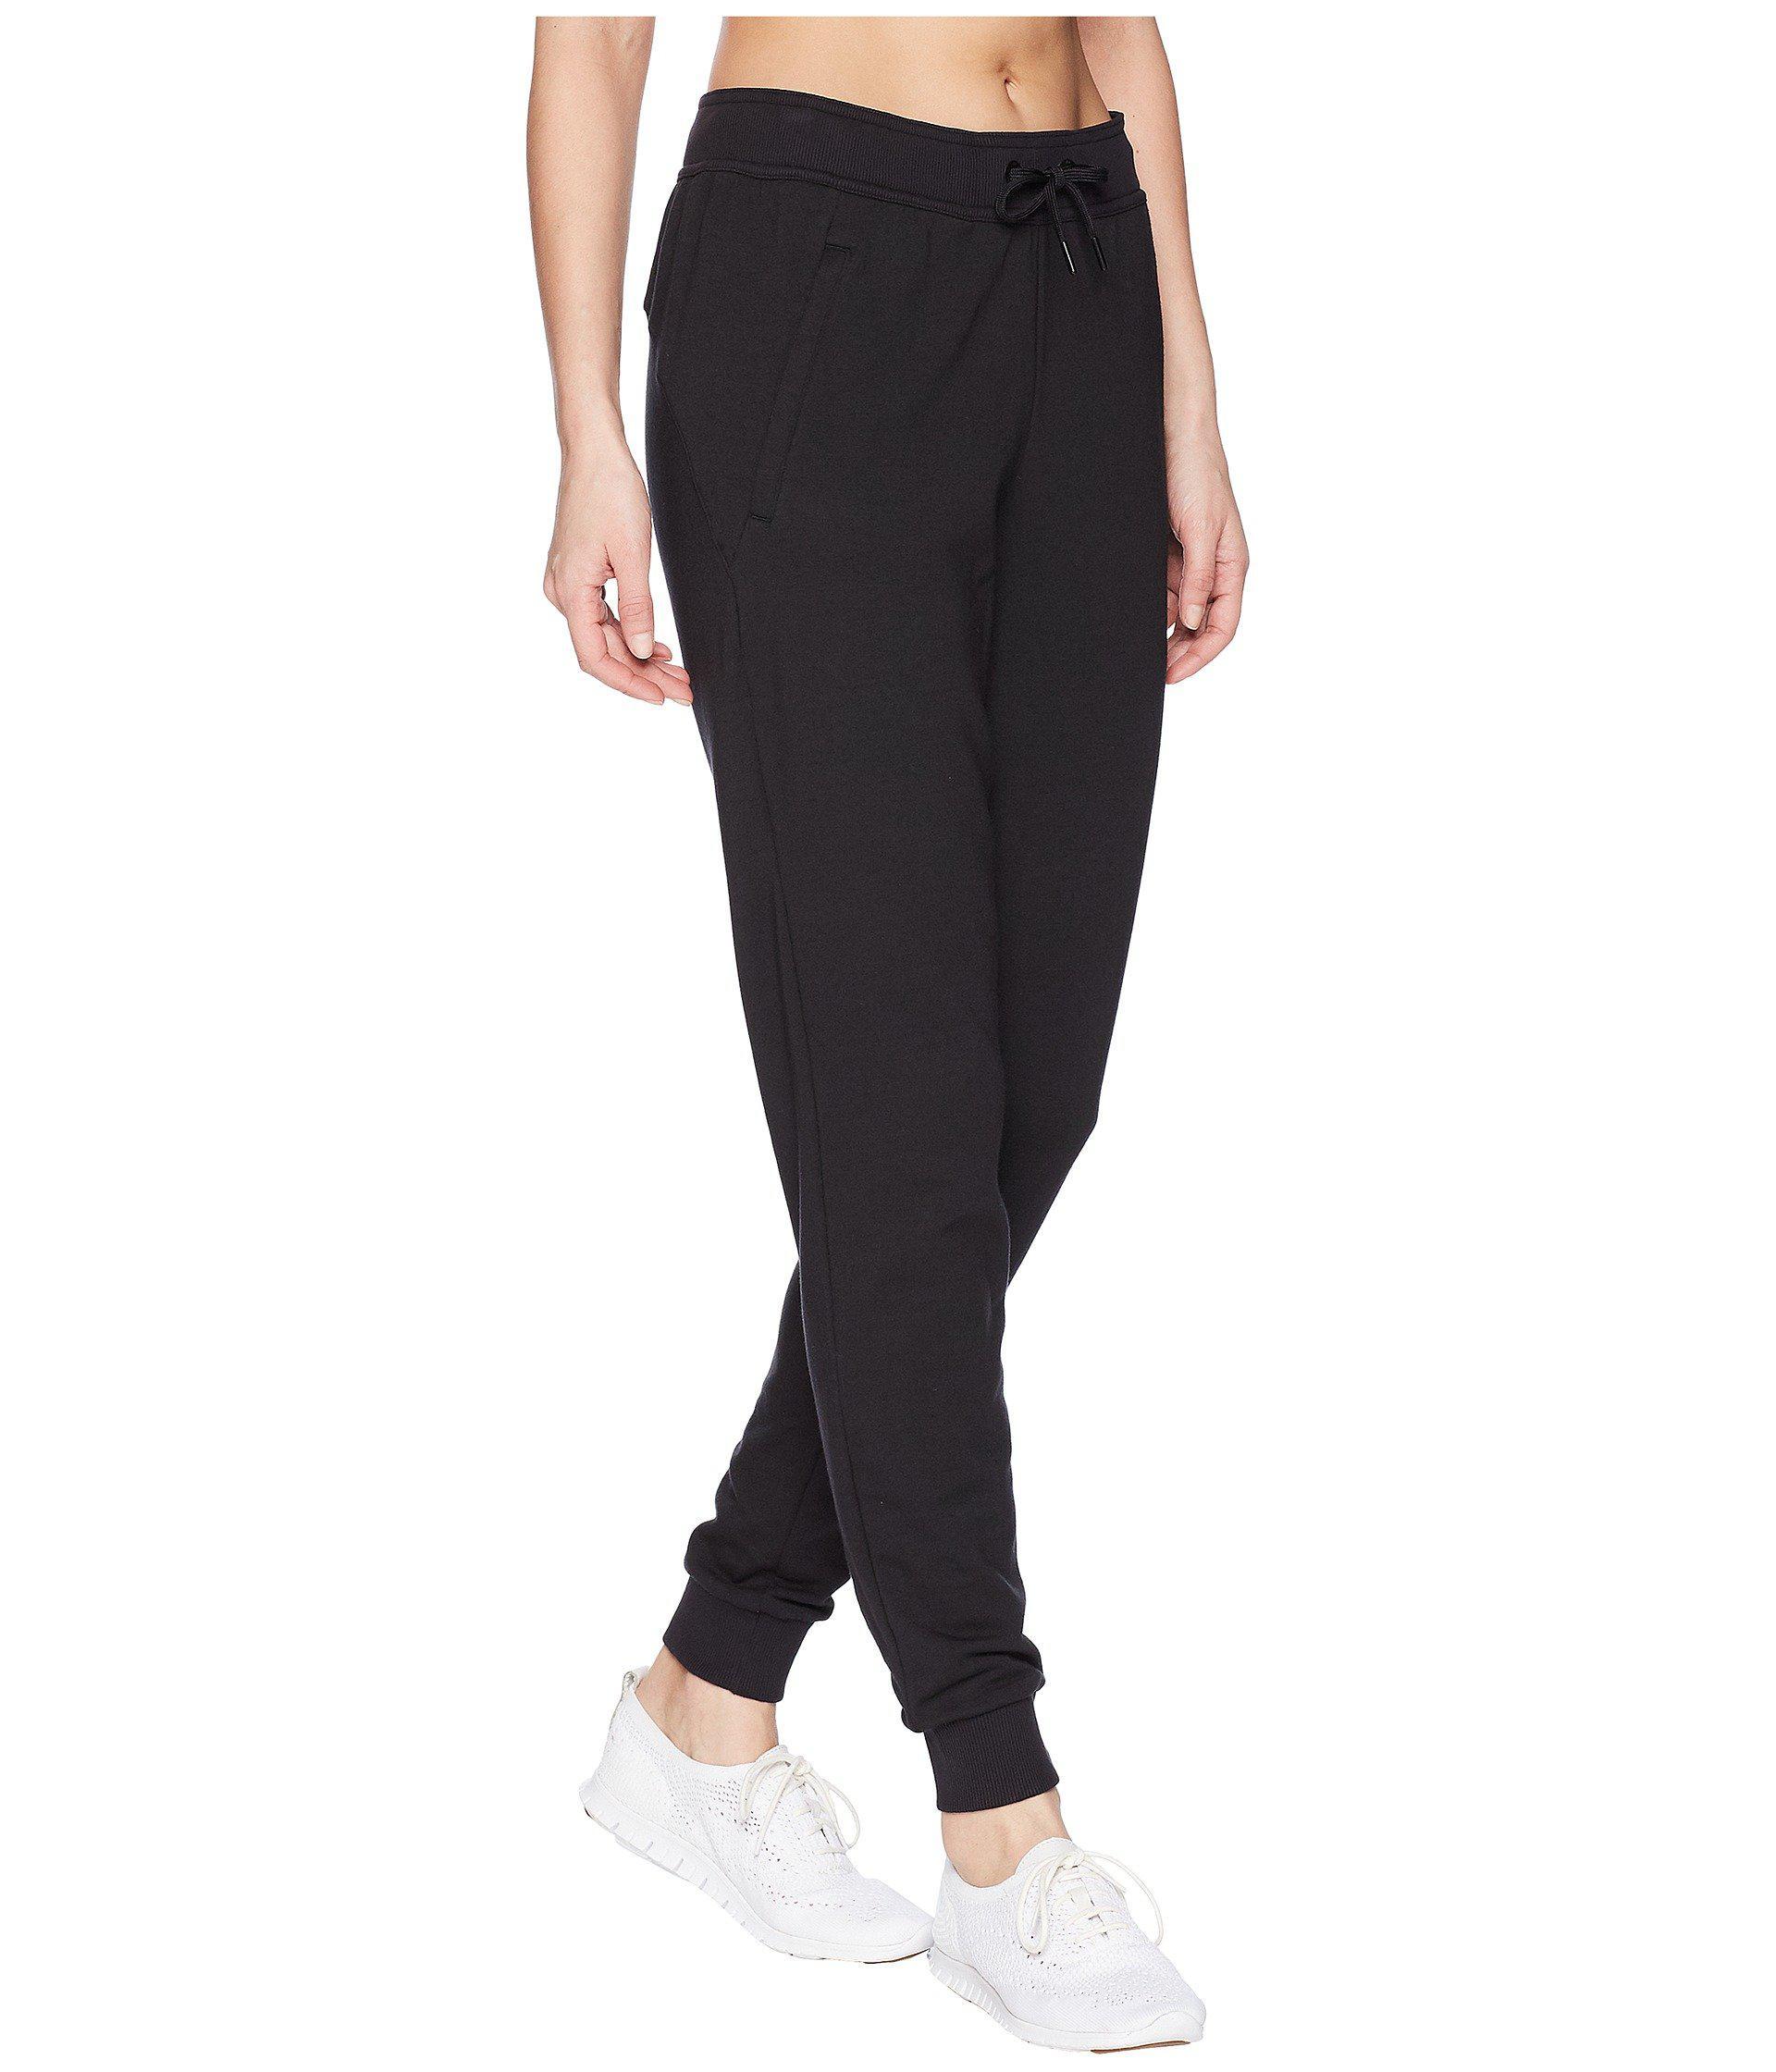 fc90ea5c96 Alo Yoga Journey Sweatpants (black) Women's Casual Pants in Black - Lyst